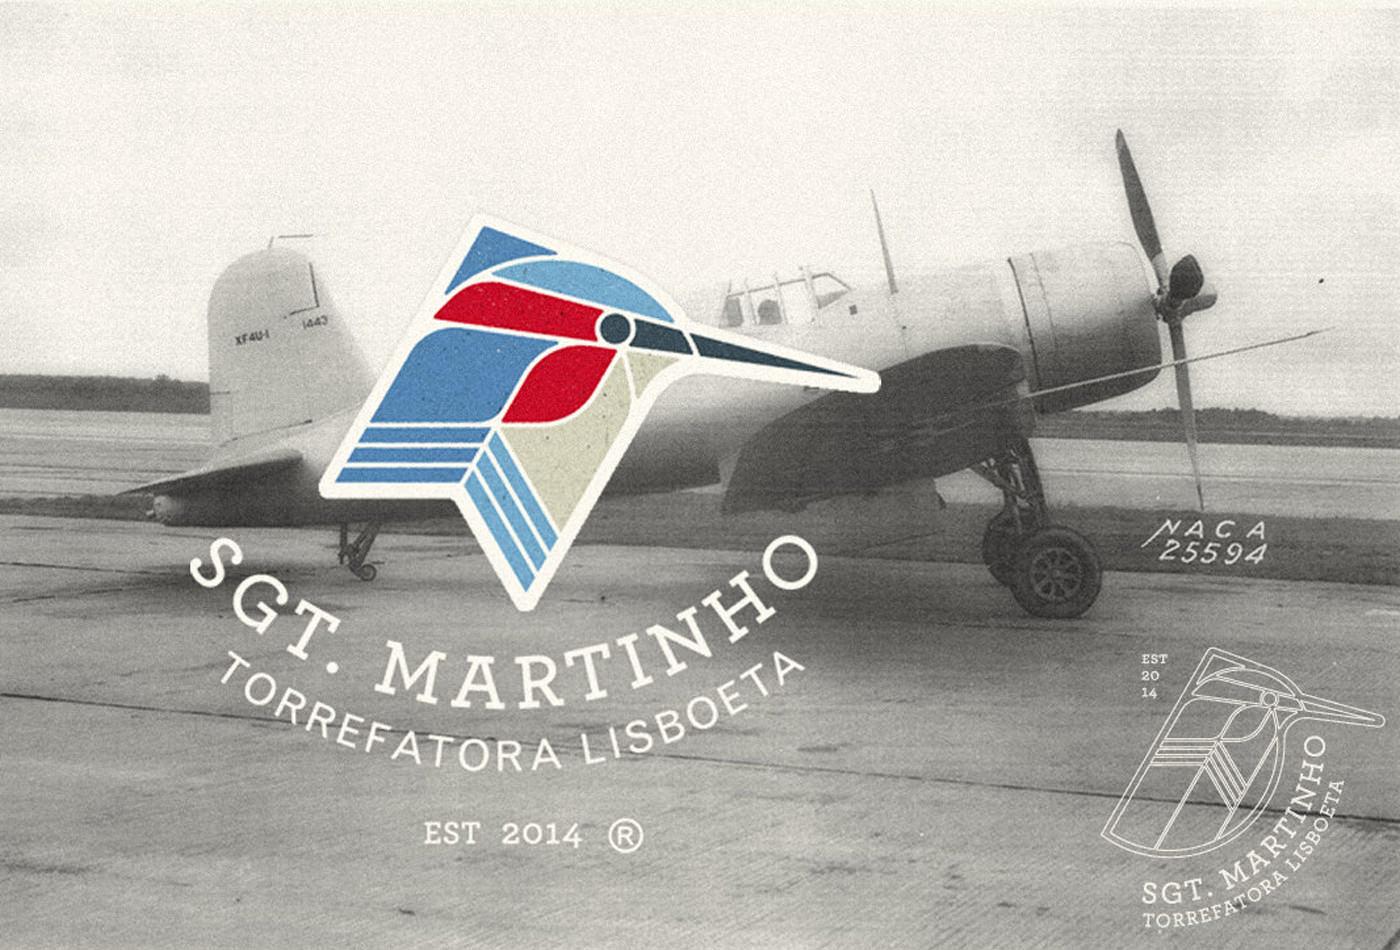 07-sargento-sergeant-martinho-coffee-brand-marks-logo-vacaliebres1